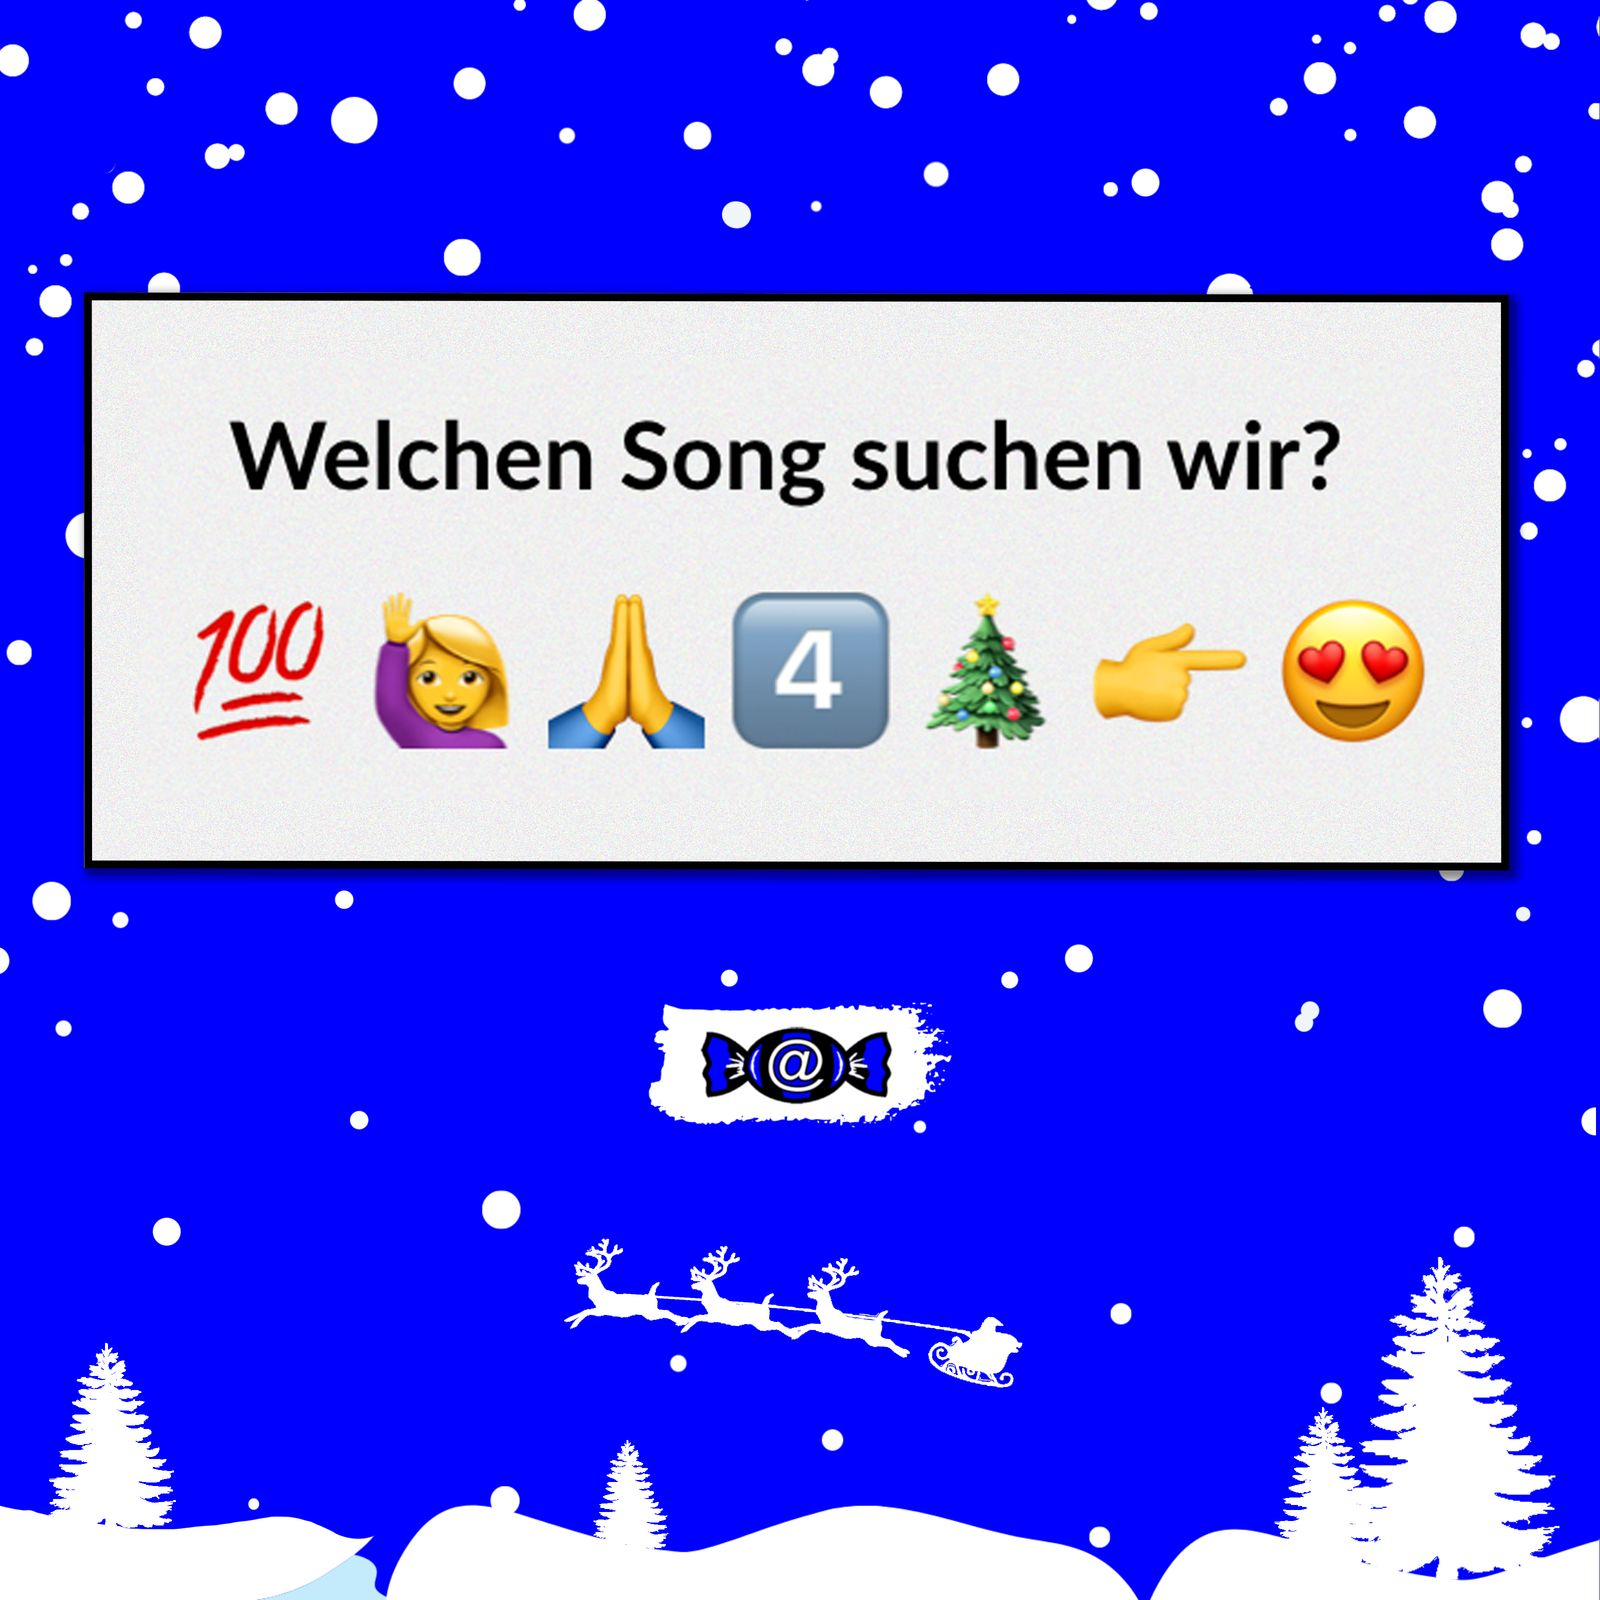 Weihnachtsrätsel-Mariah Carey